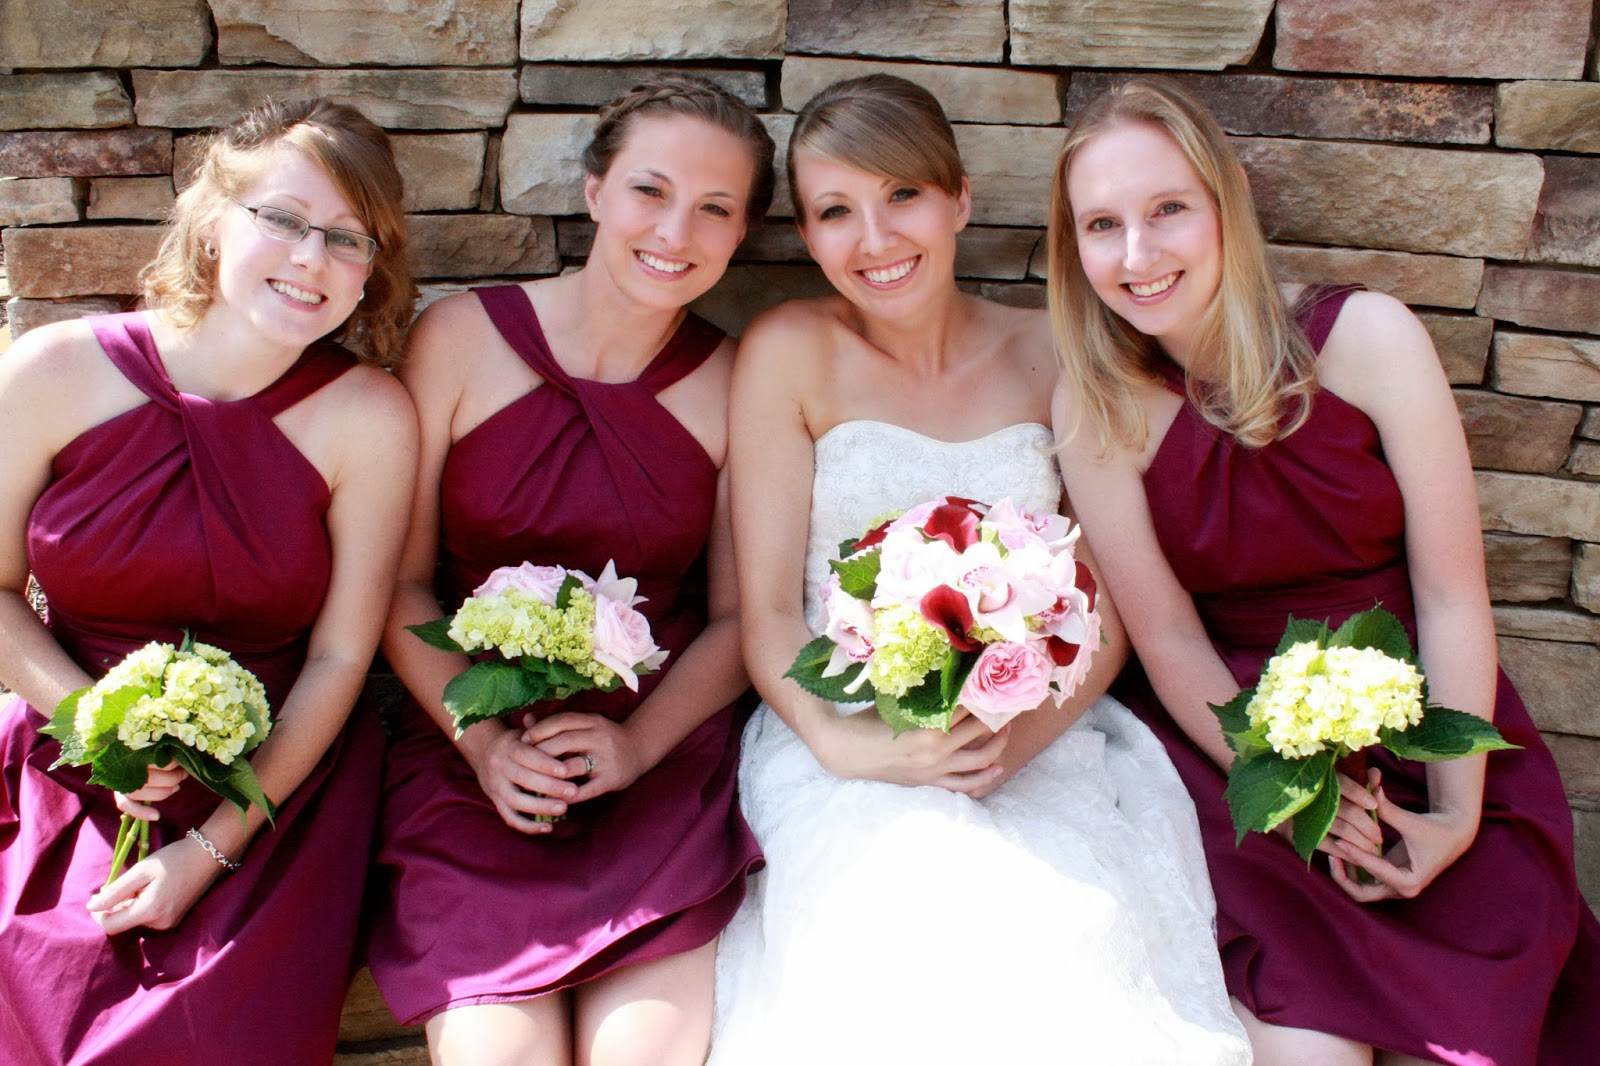 d627d6f6196 Short sangria bridesmaid dress and lace wedding dress